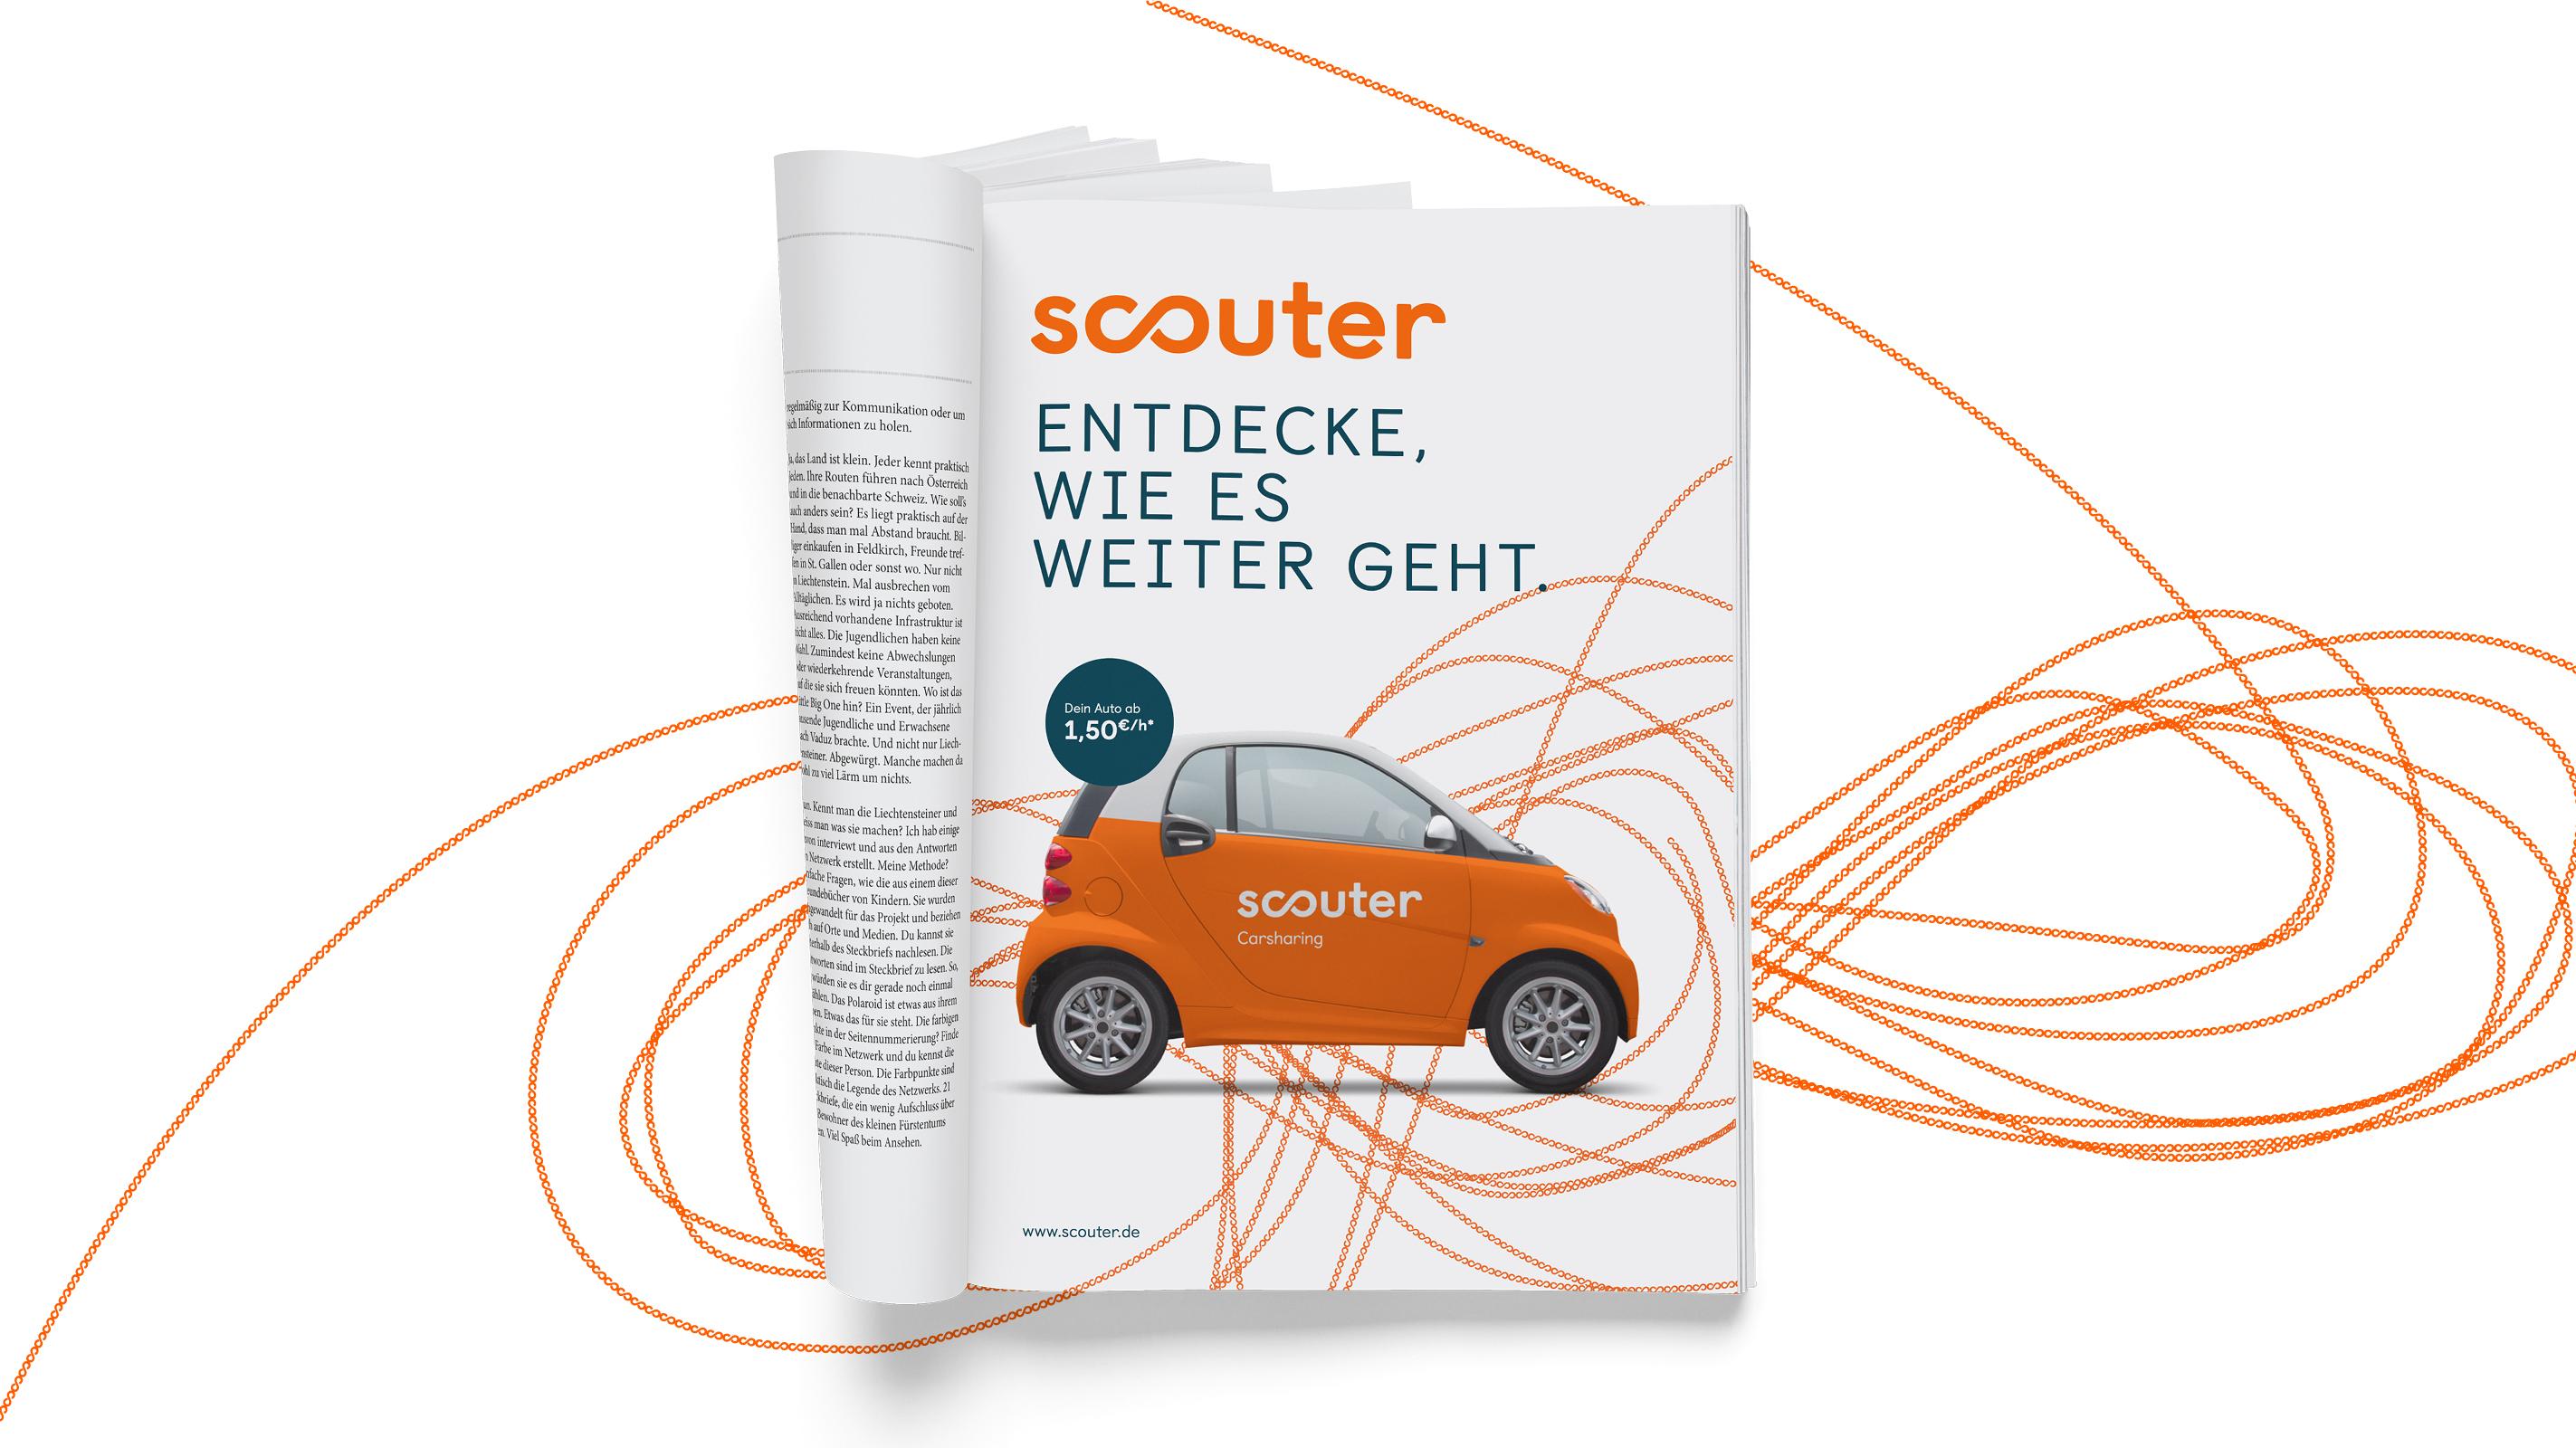 Scouter Carsharing – Poarangan Brand Design6